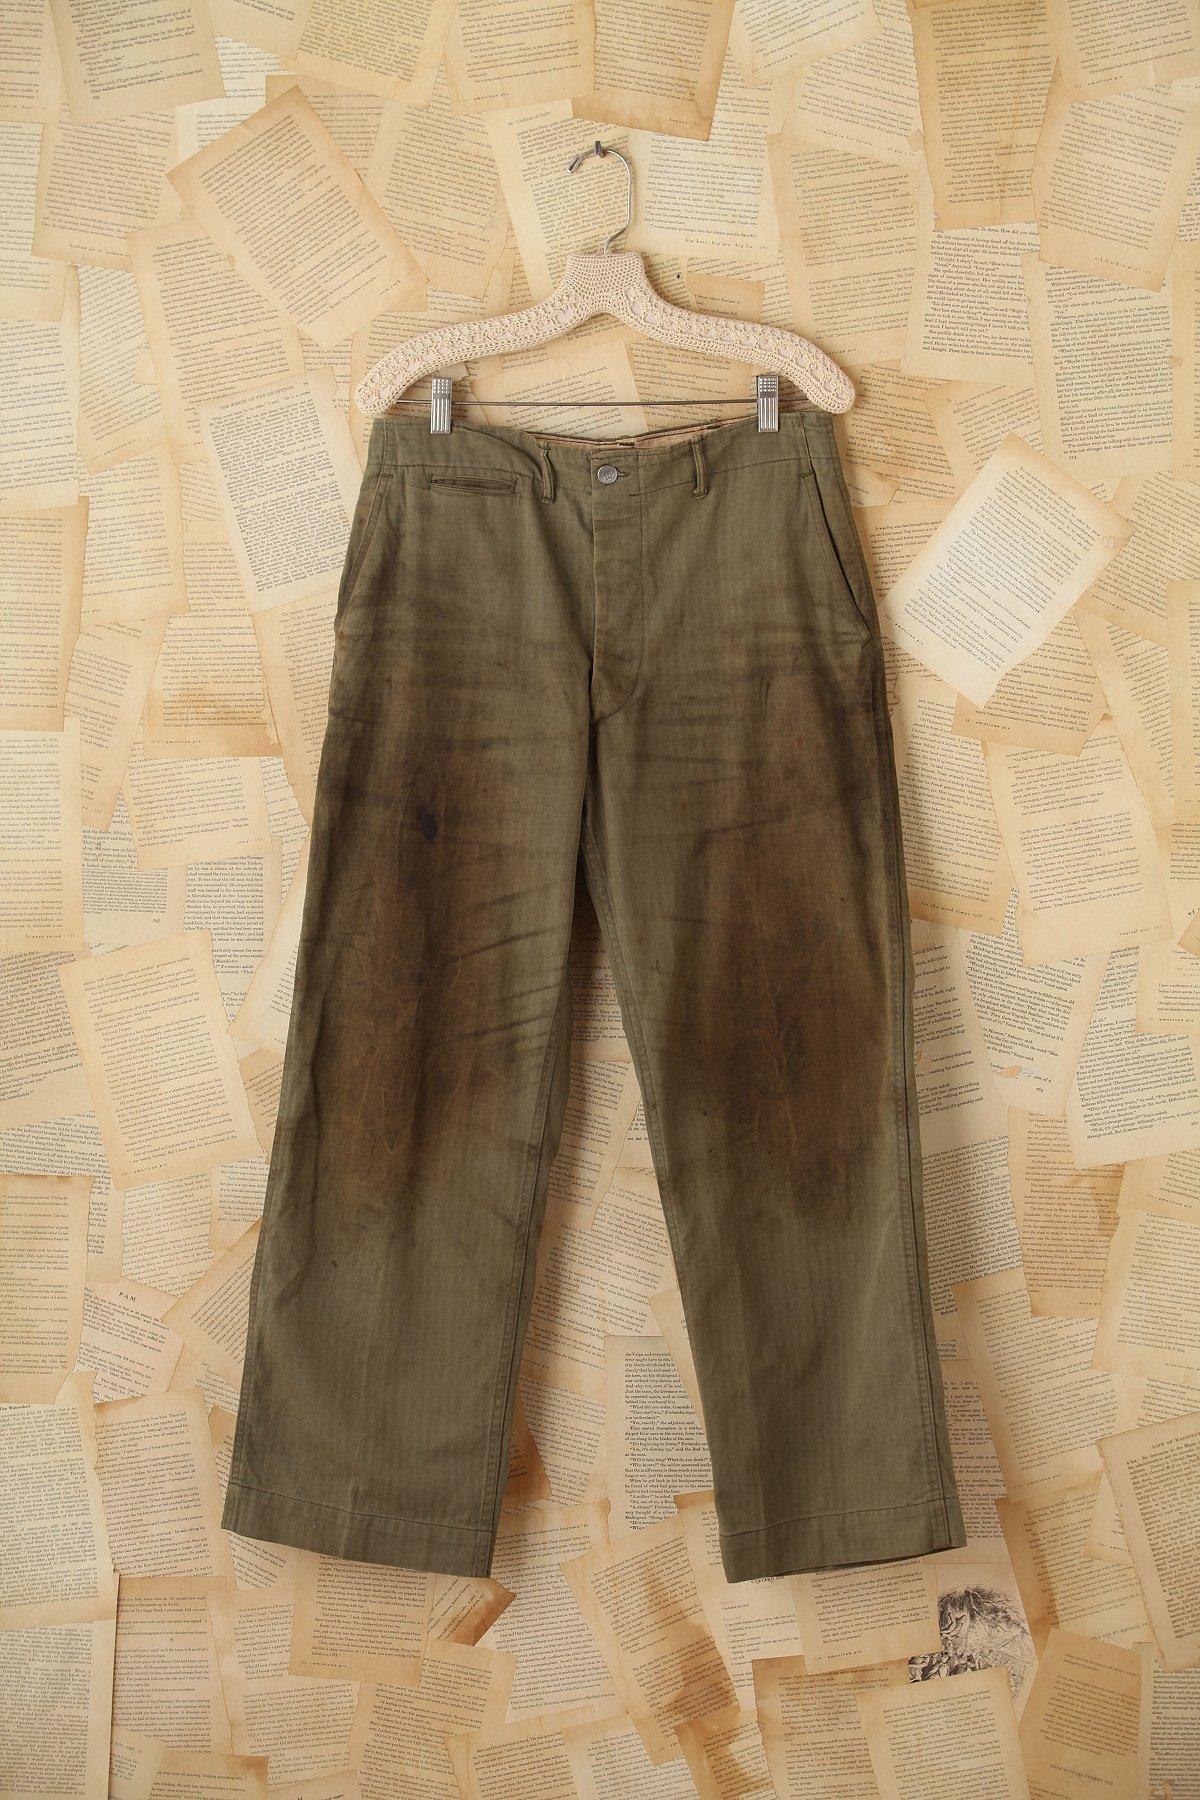 Vintage Distressed Military Cargo Pants